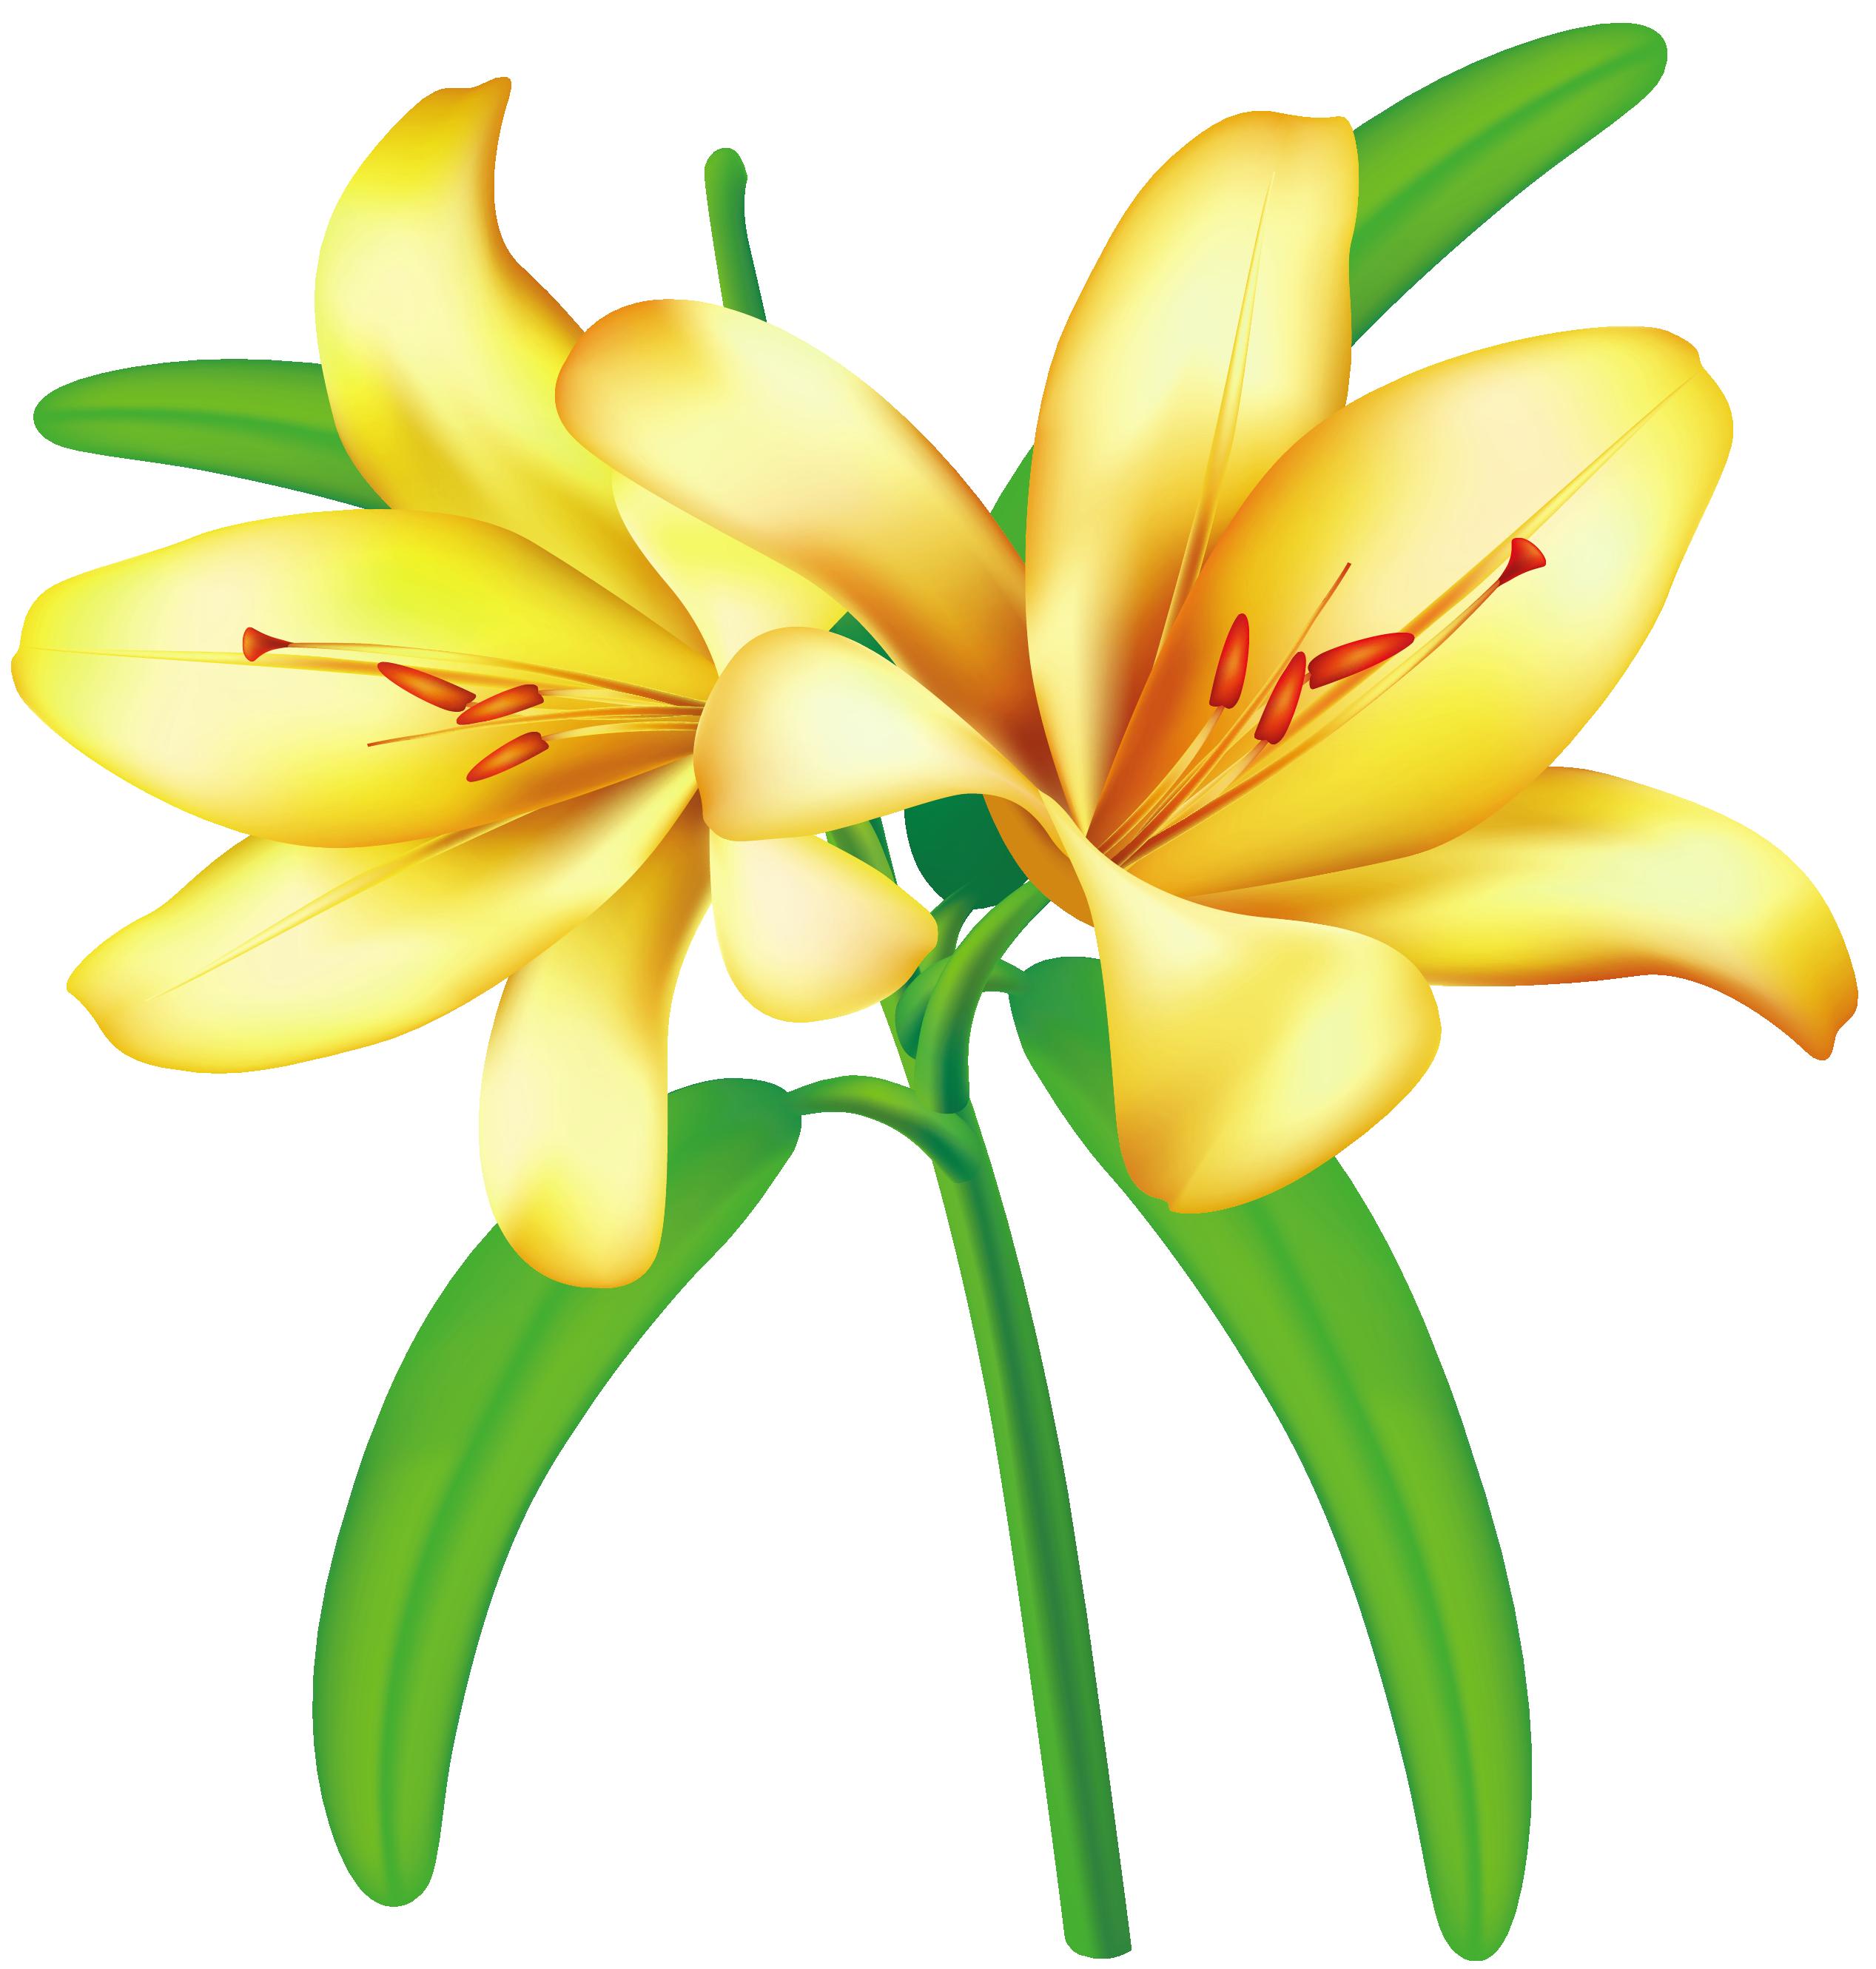 lily clipart yellow jessamine